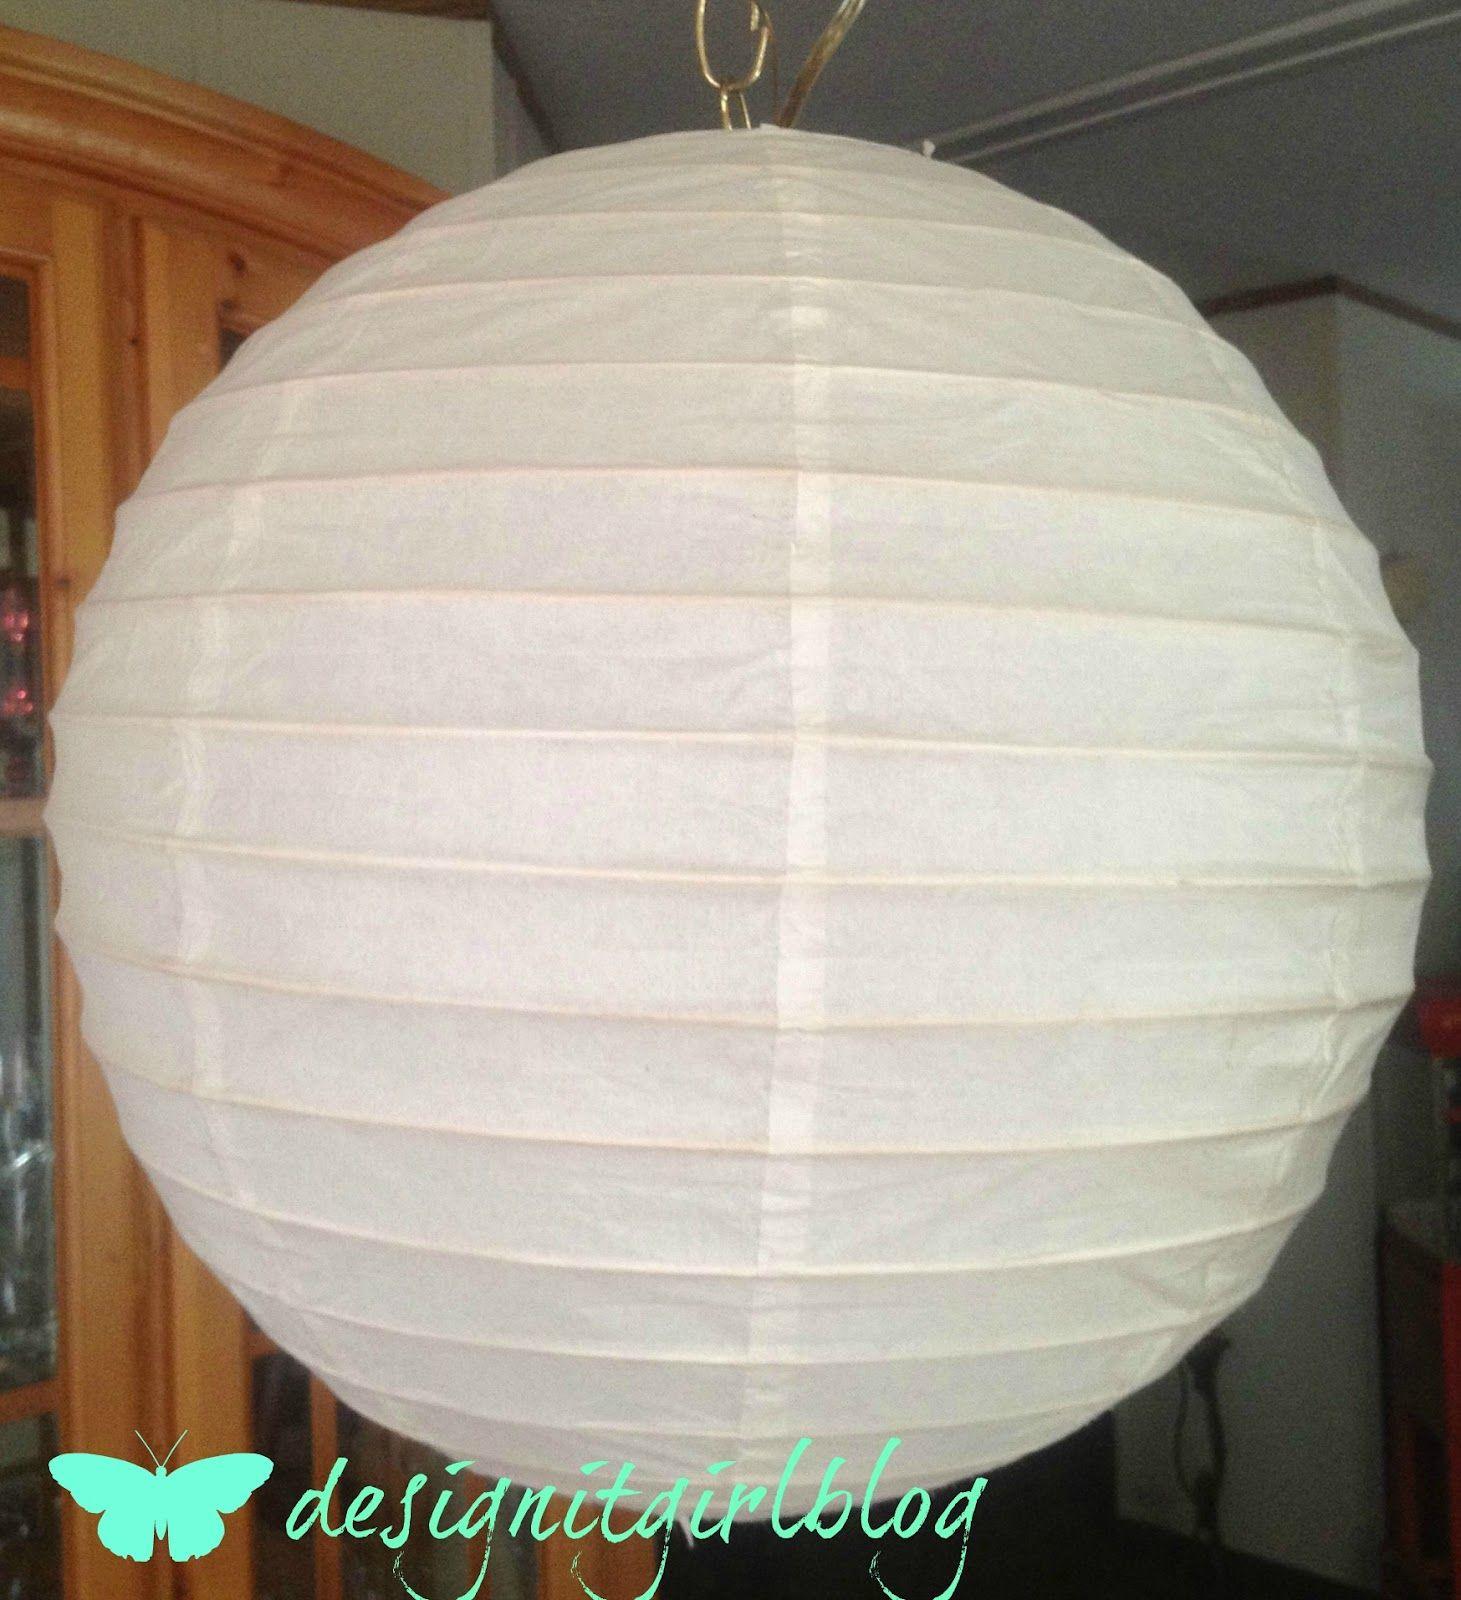 Designitgirlblog DIY Round Paper Lantern